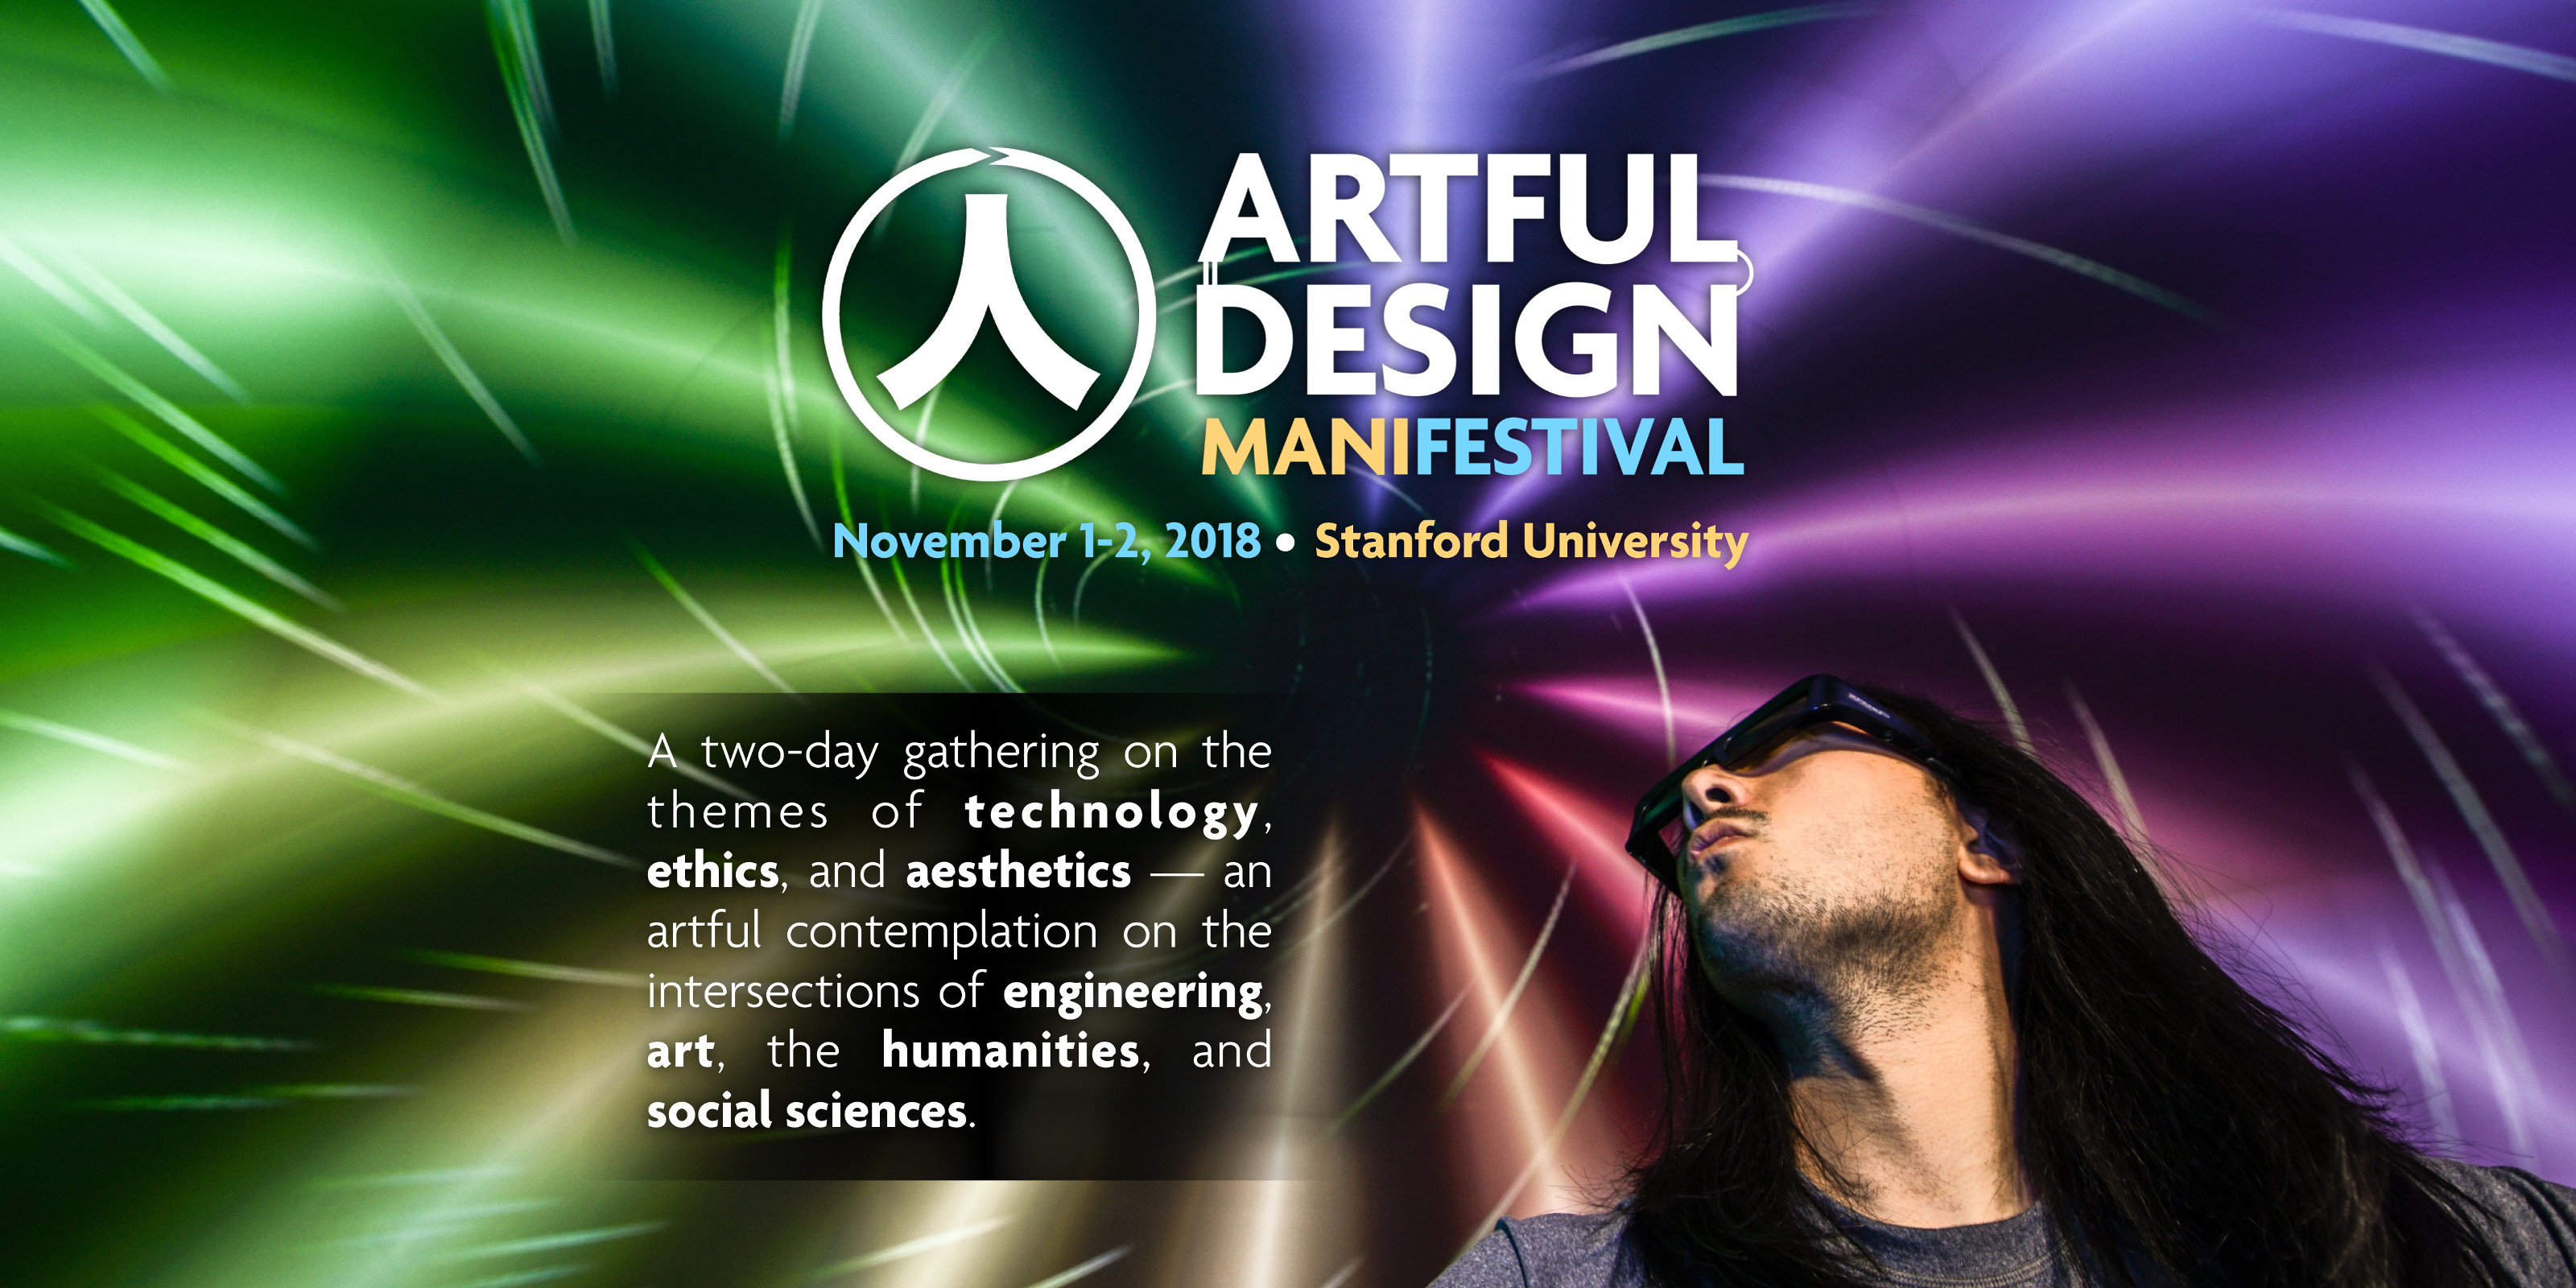 Artful Design | Manifestival 2018